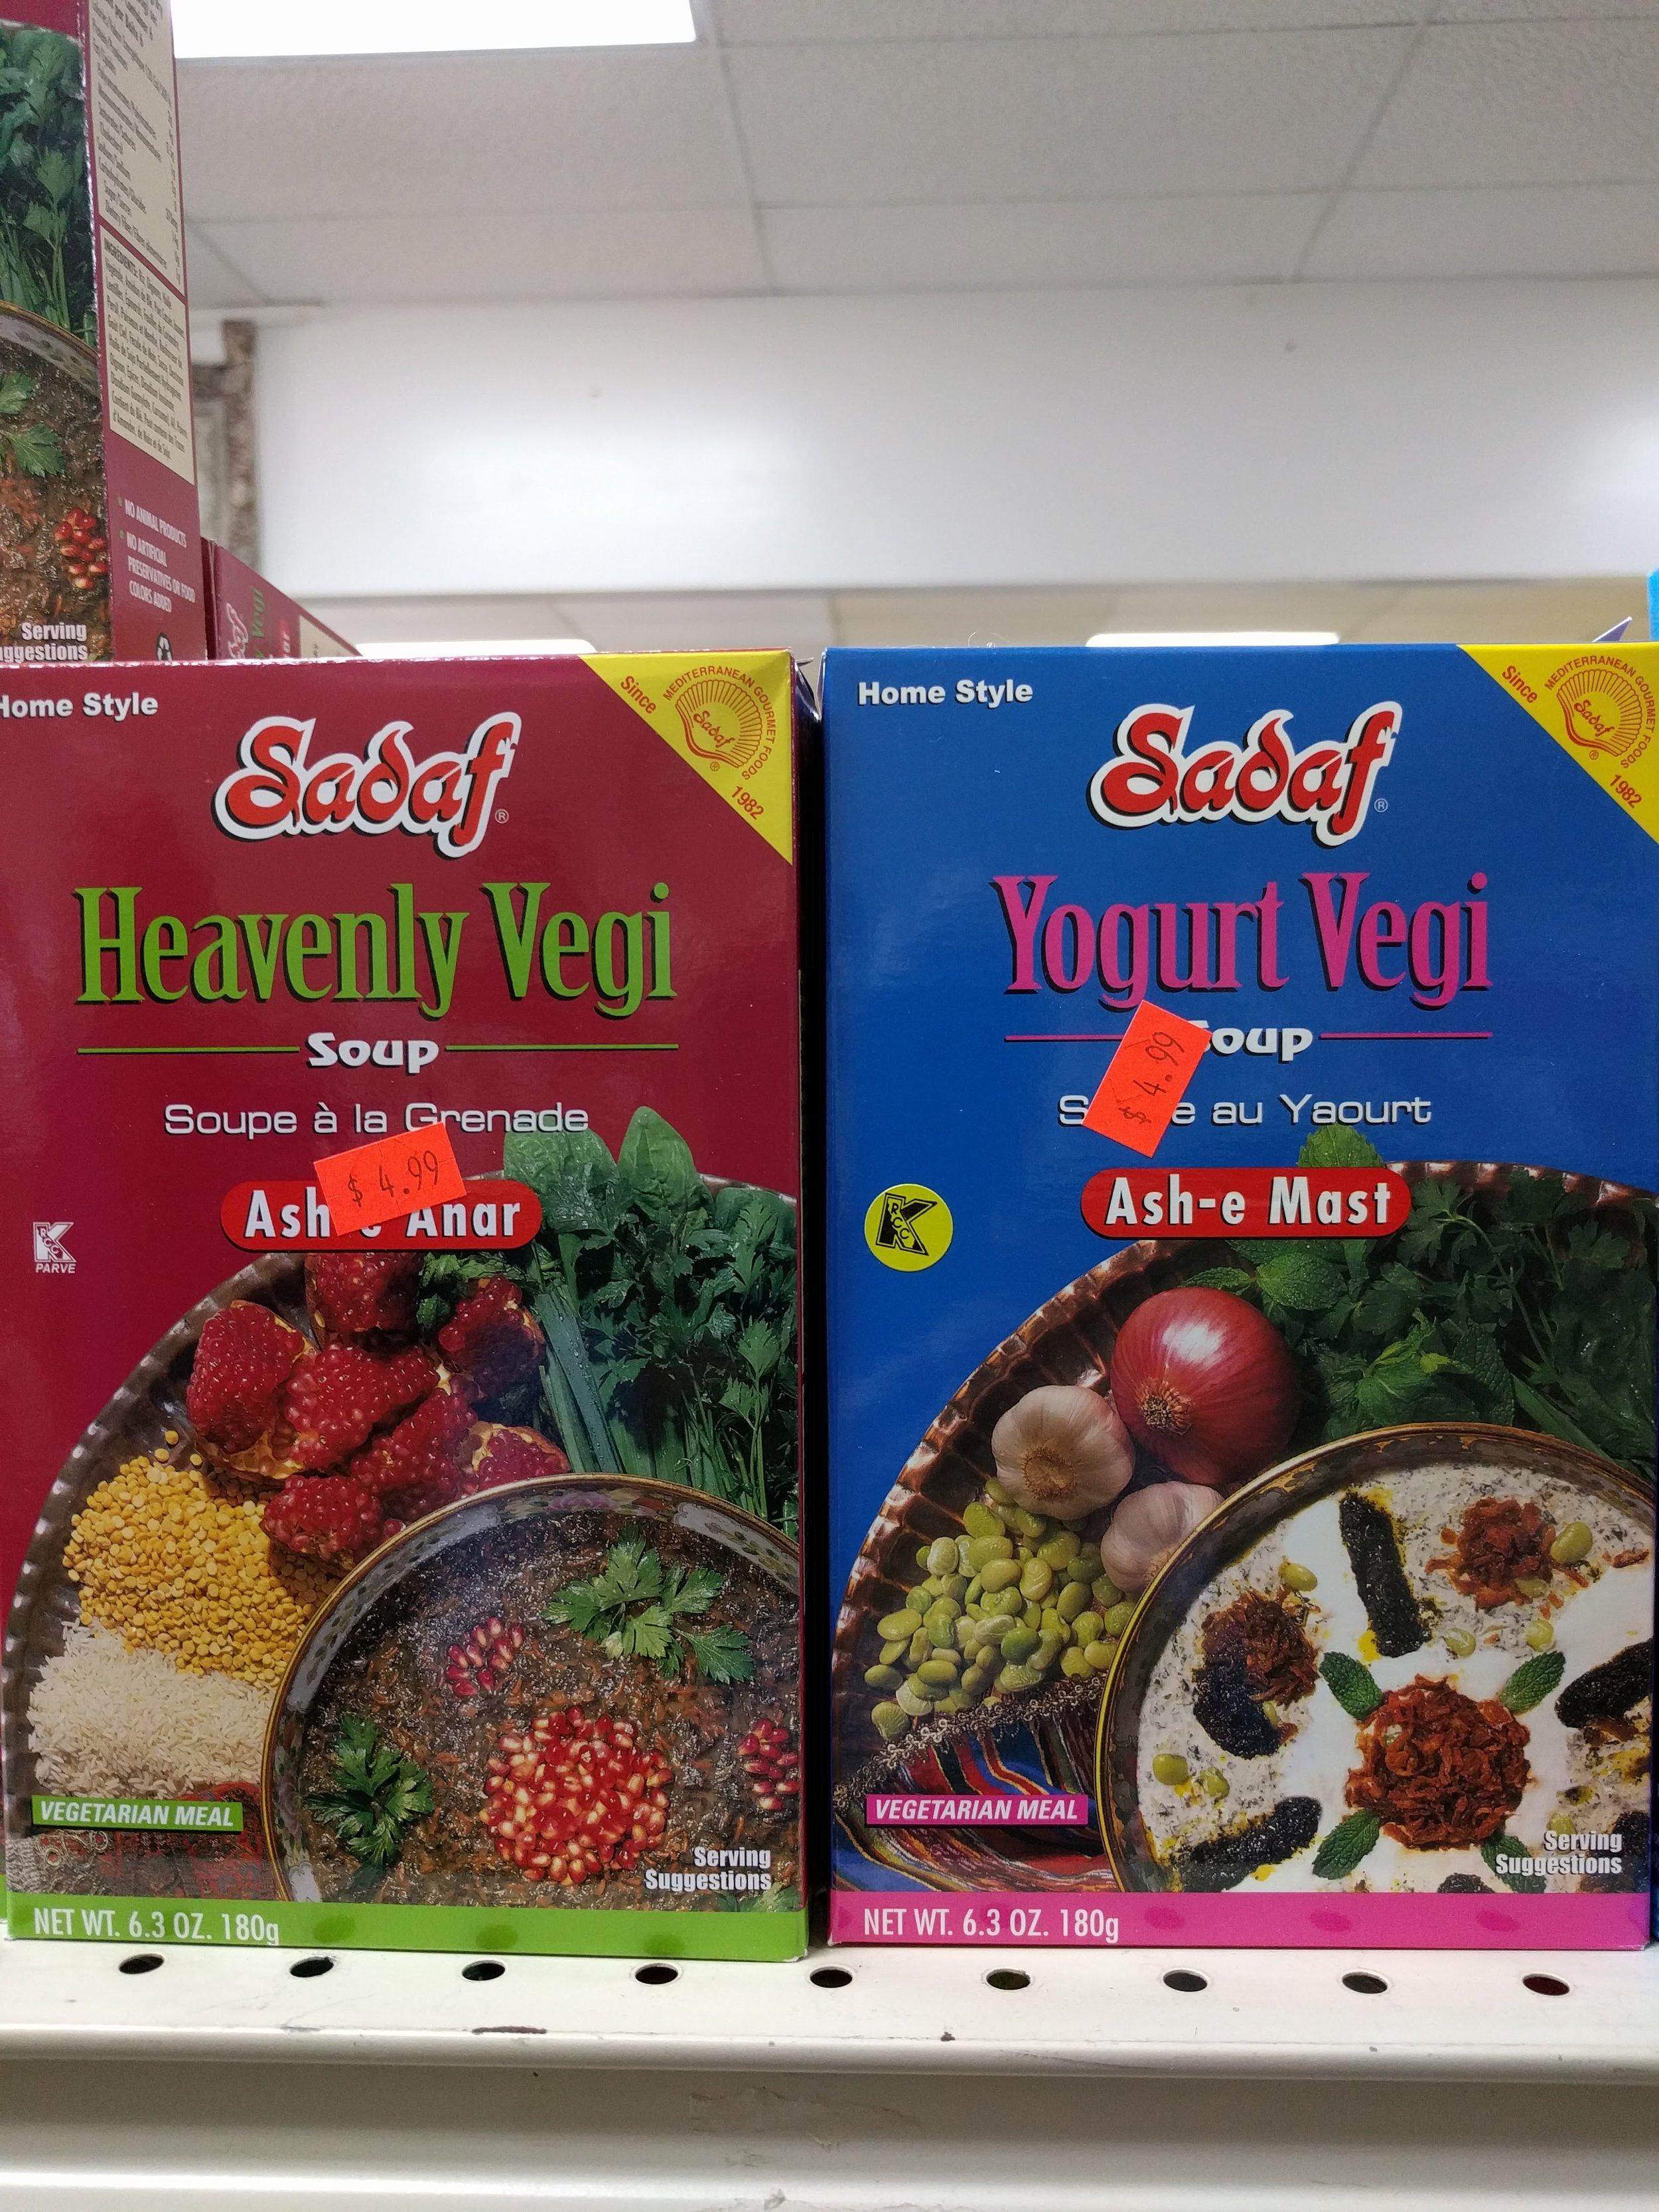 Sadaf-Soup-Mix-Pak-Halal-International-Foods-12259-W-87th-St-Pkwy-Lenexa-KS-66215.jpg